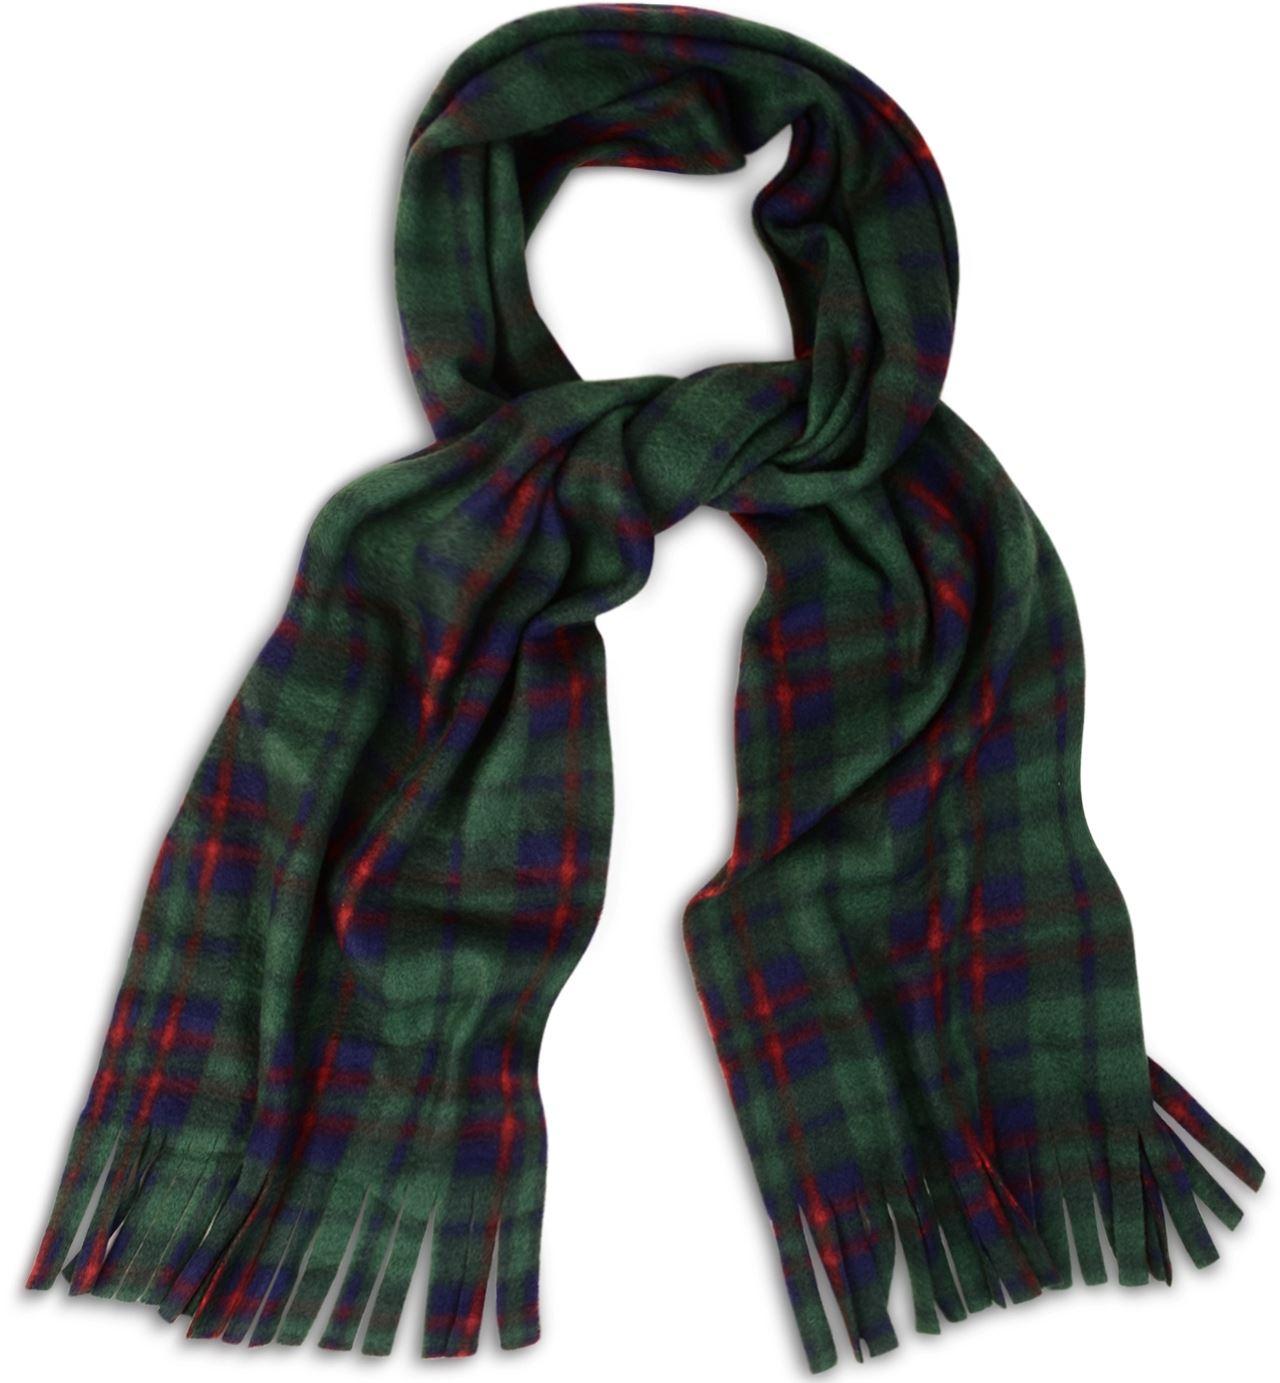 soft cosy and warm tartan check fleece scarf